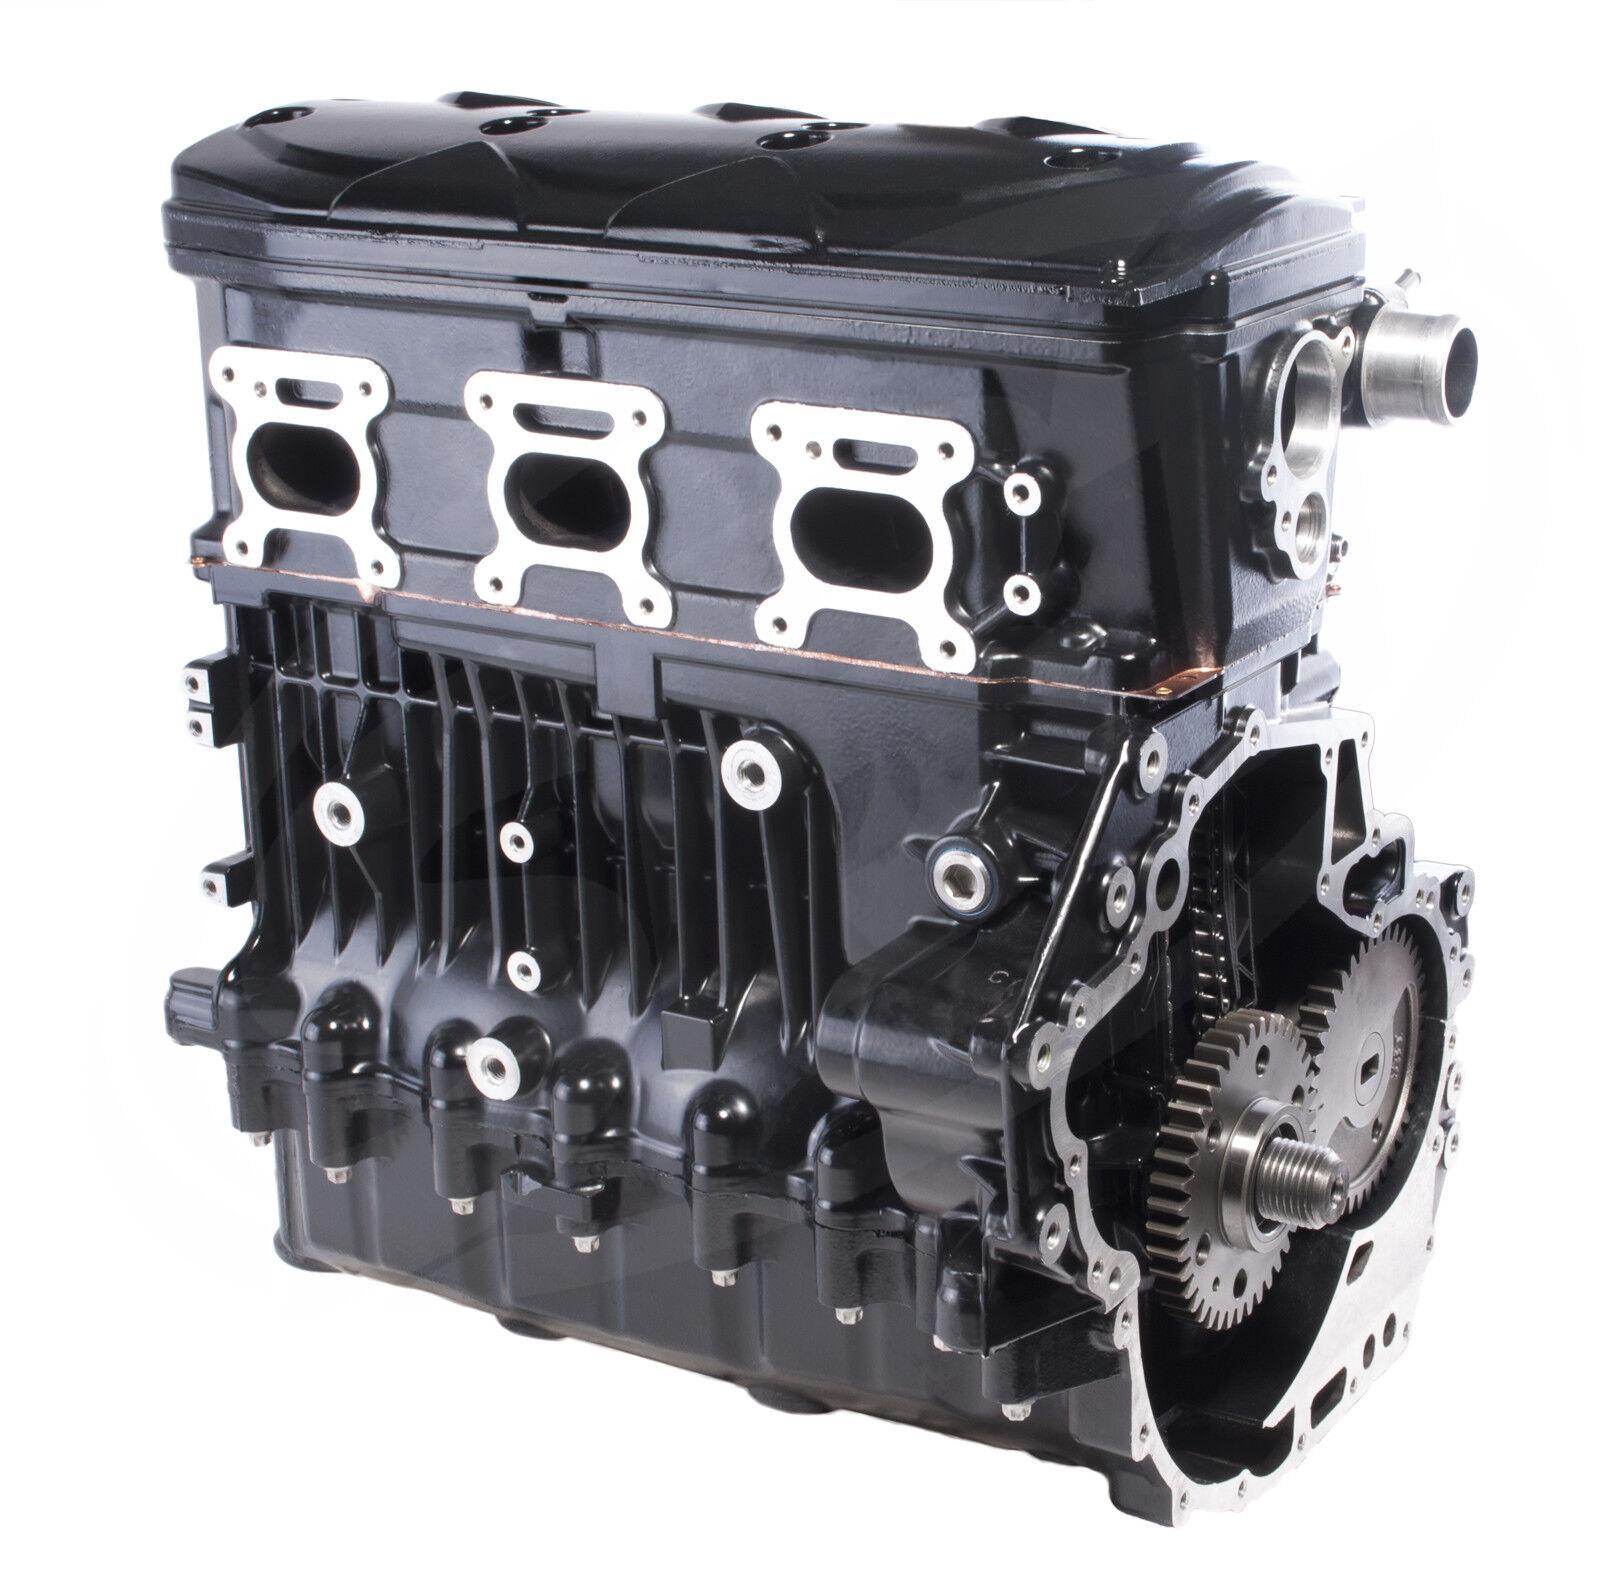 Sea-Doo Motor 2011 4-Tec 255 Na Se Sp GTX Rxt Ltd Rxp Rxt GTX Challenger Speedster Sbt 3f5aa3